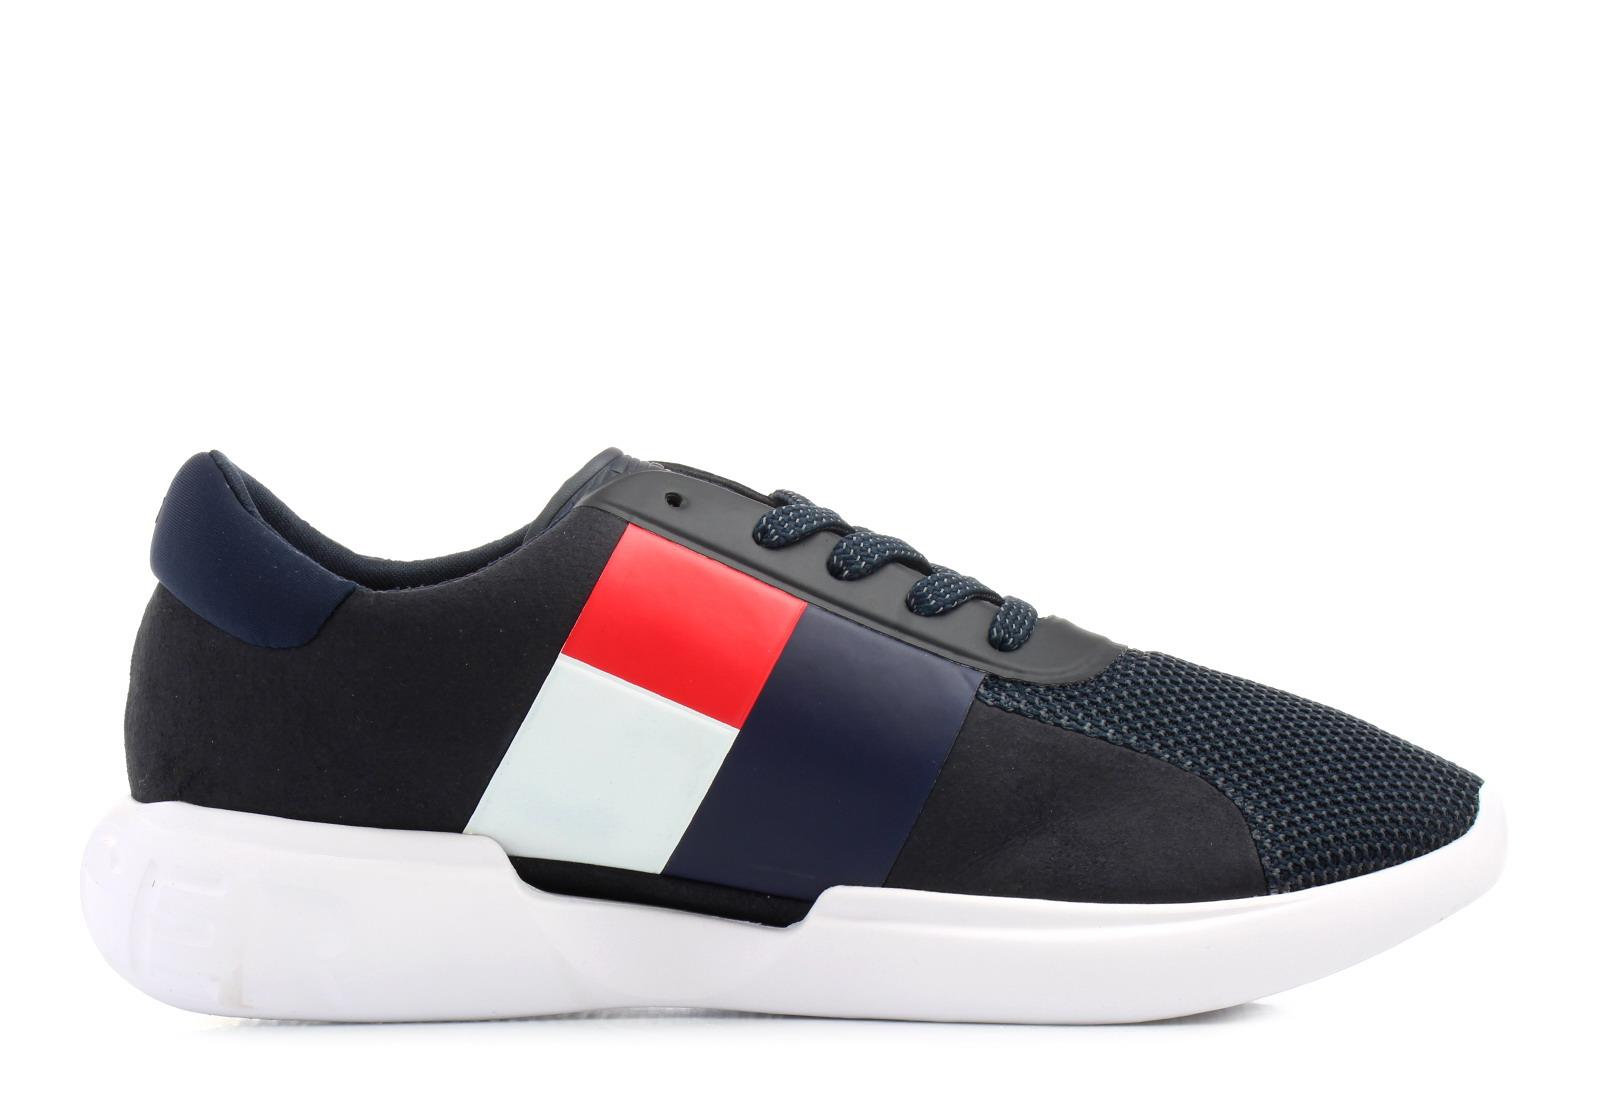 551cb9ce74 Tommy Hilfiger Shoes - Tate 1c - 18F-1824-403 - Online shop for ...